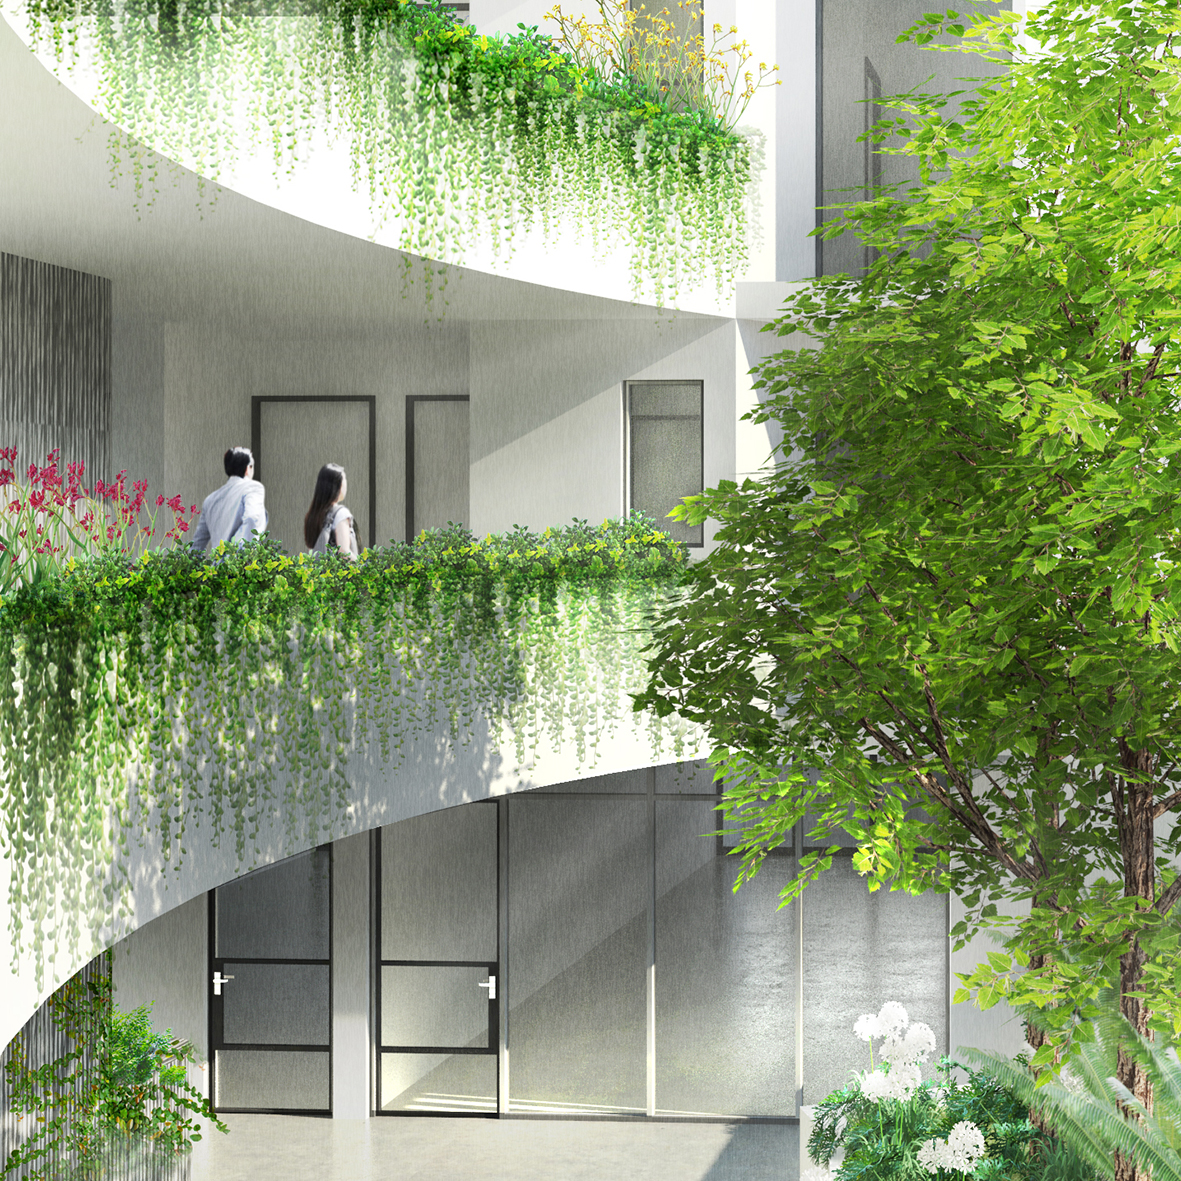 + Carr Place - Landscape [Multi Residential]